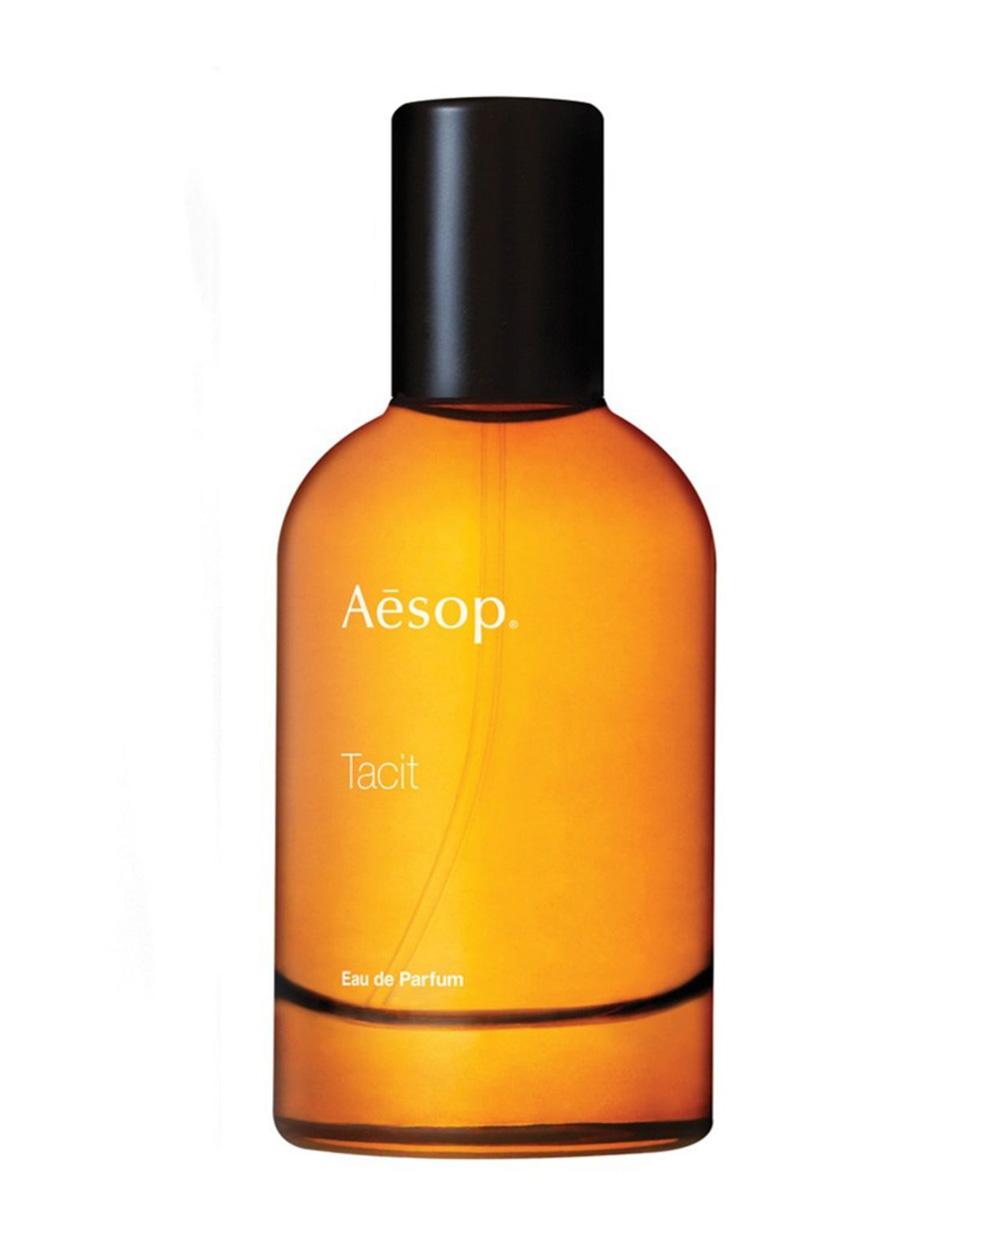 Aesop Tacit uniseks parfem